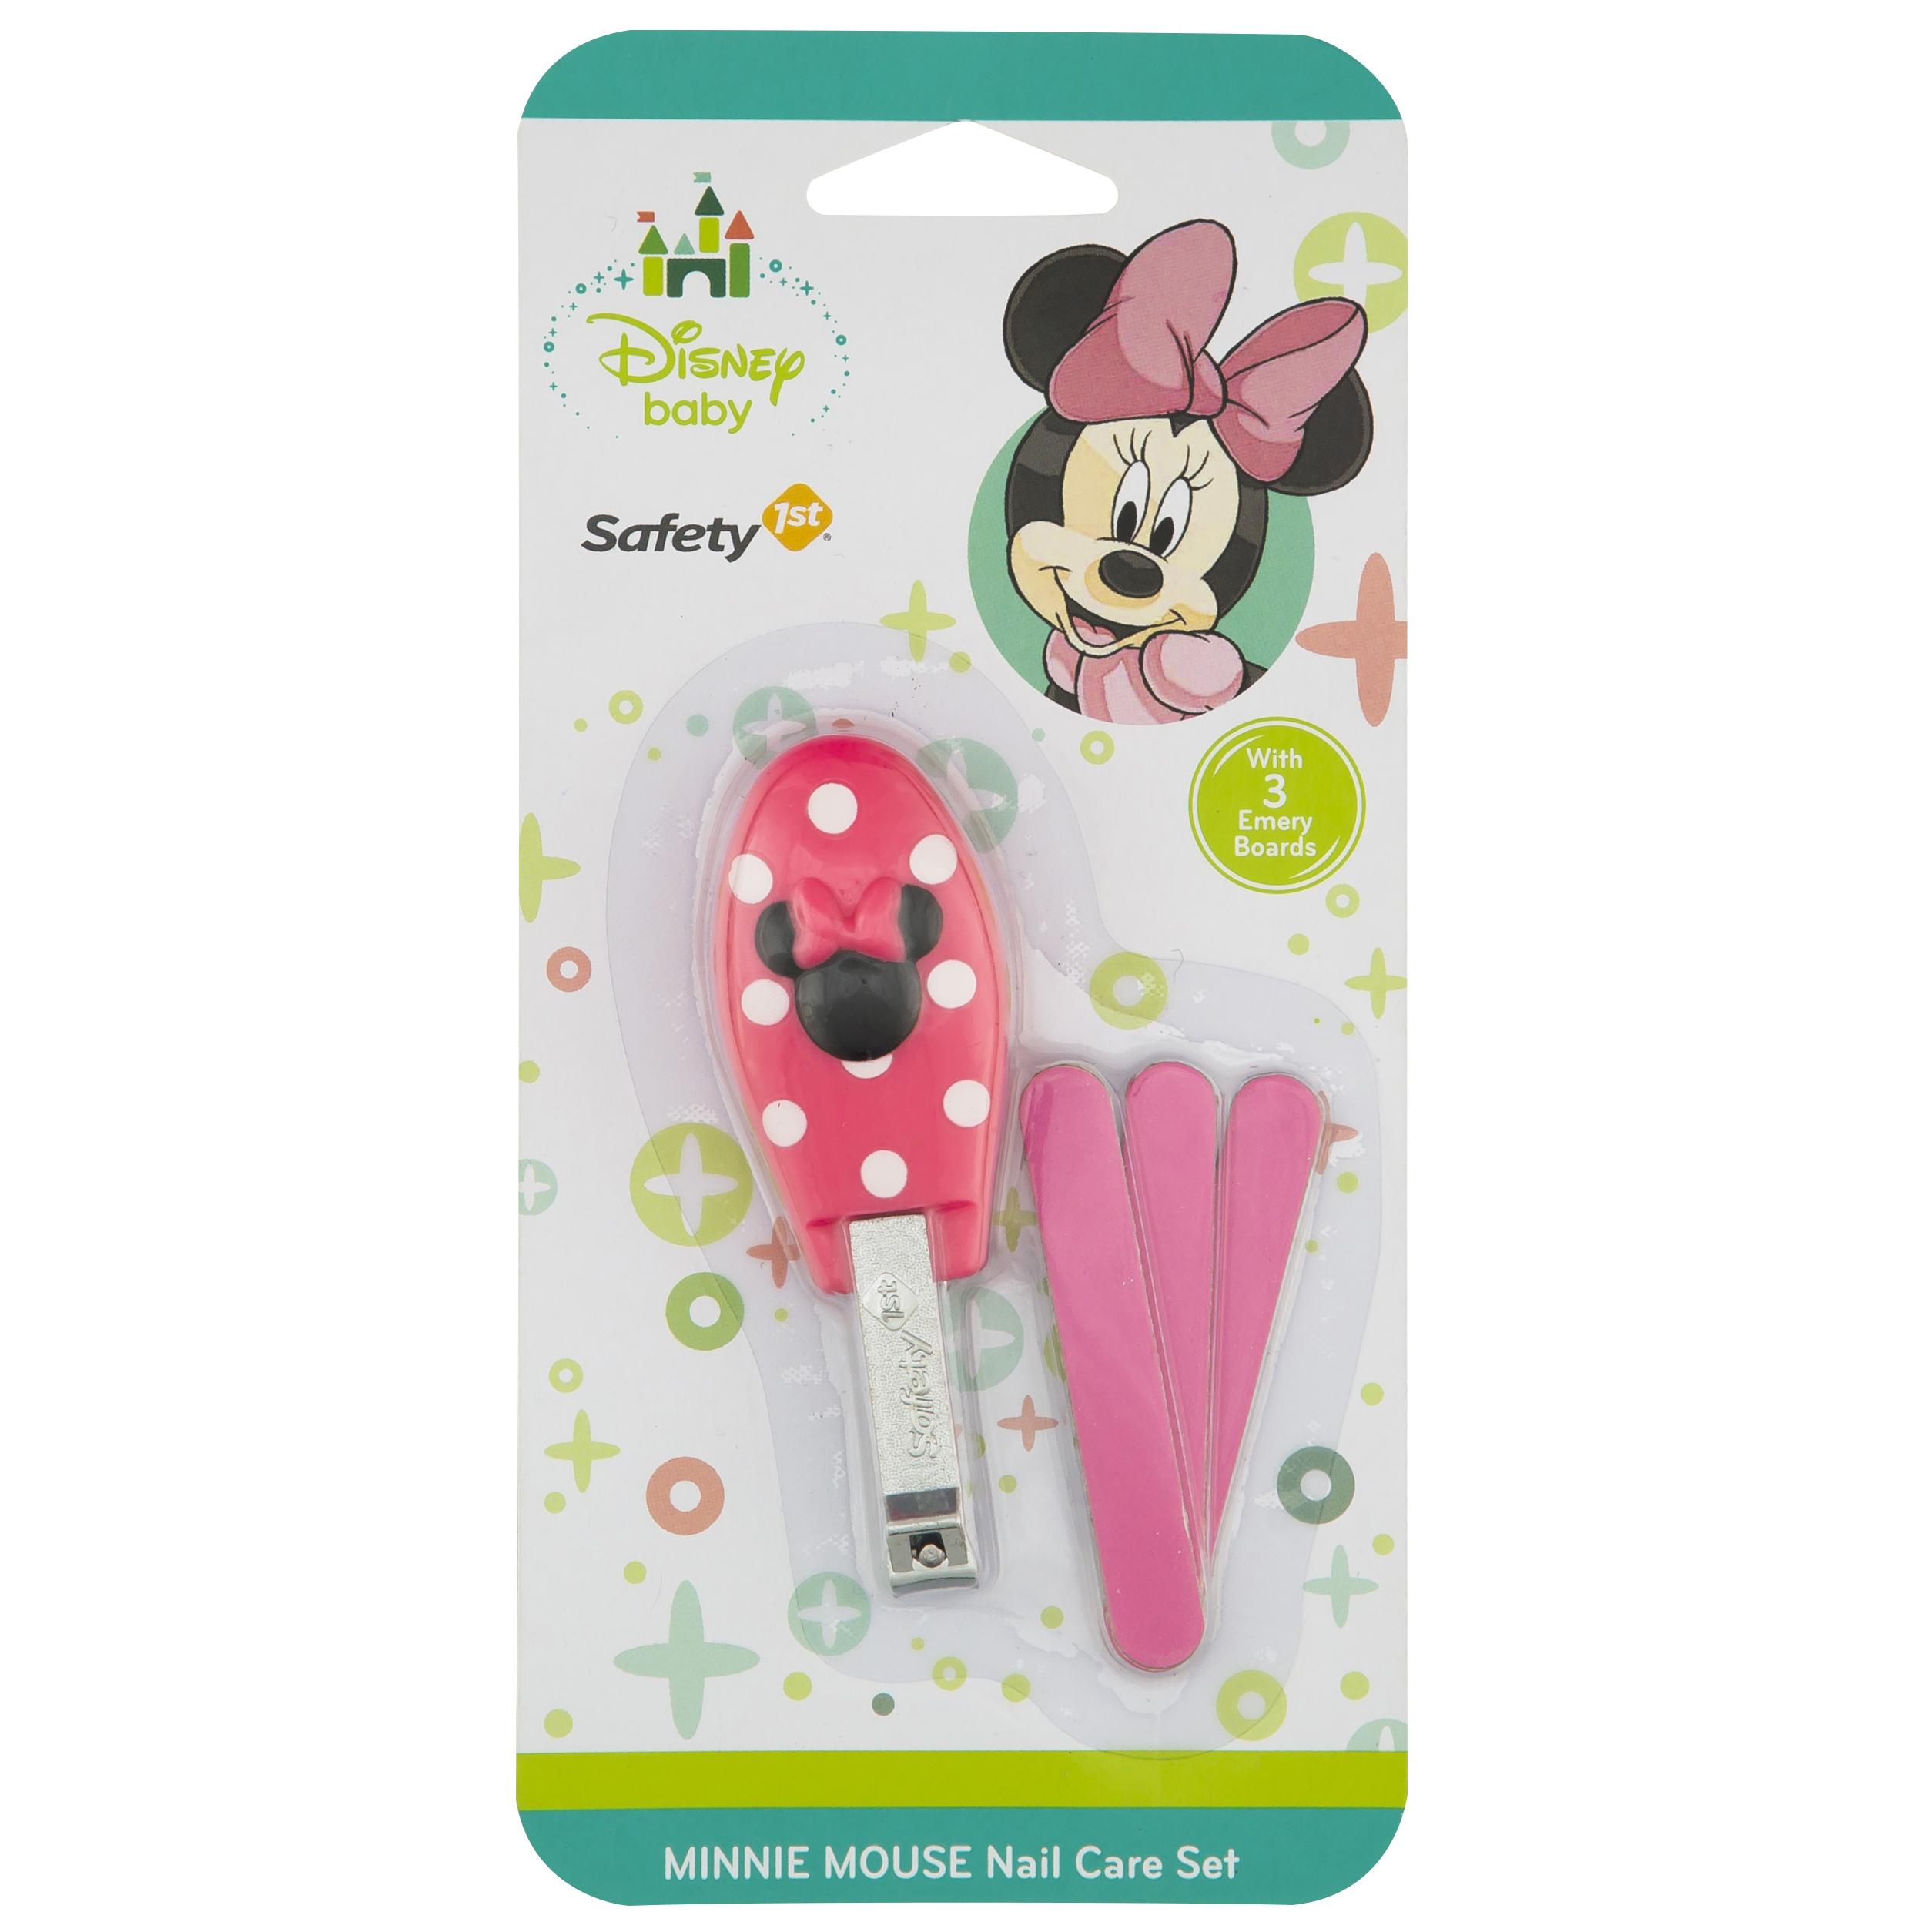 Disney Baby Minnie Nail Care Set, Minnie